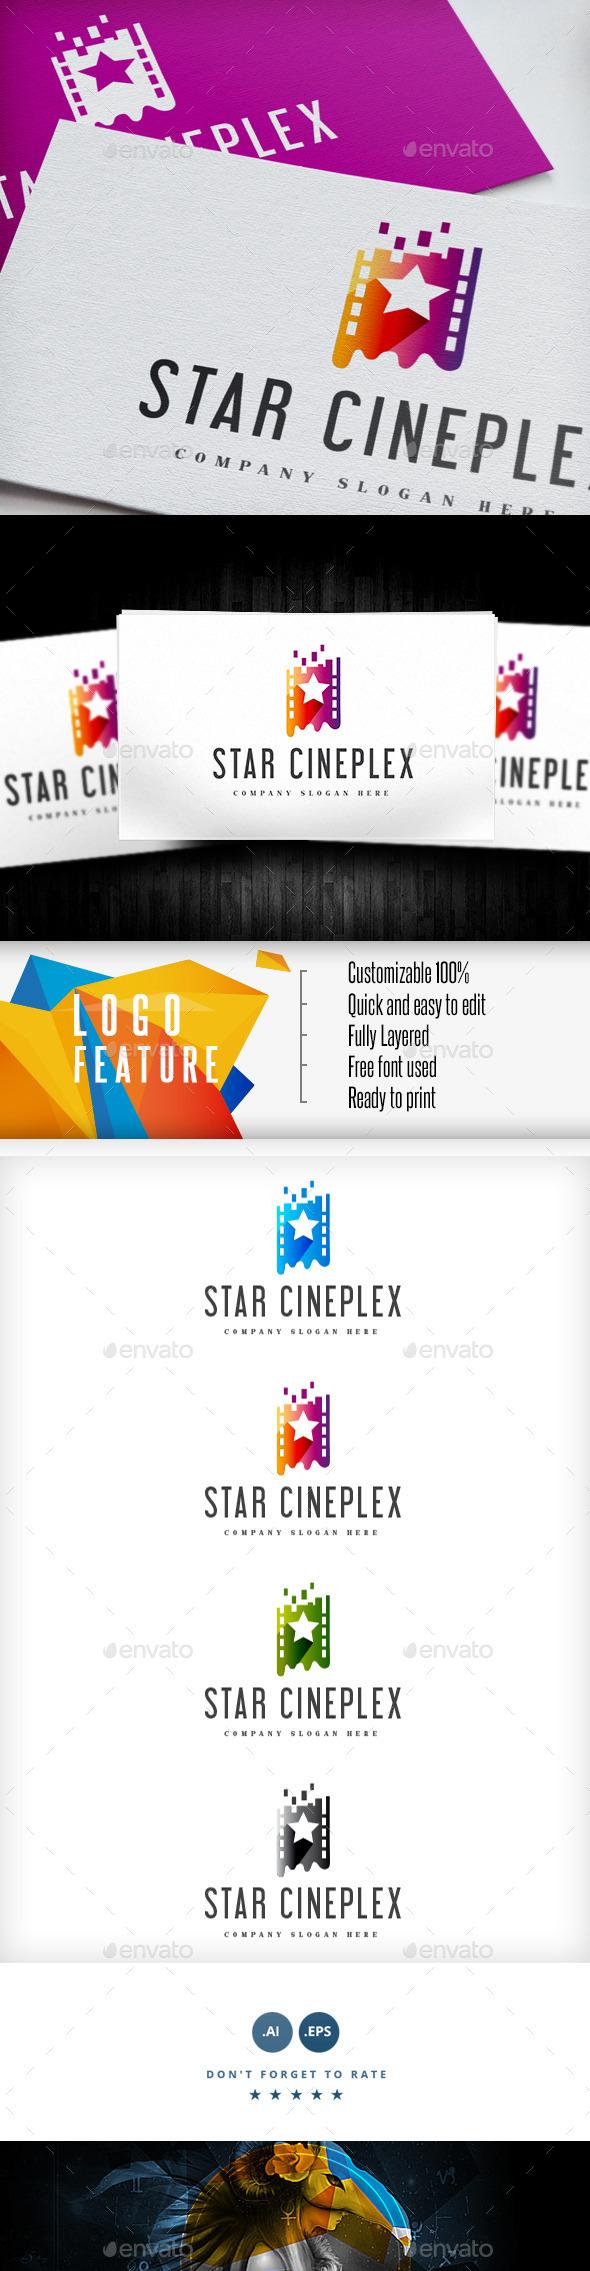 GraphicRiver Star Cineplex Logo 9278108